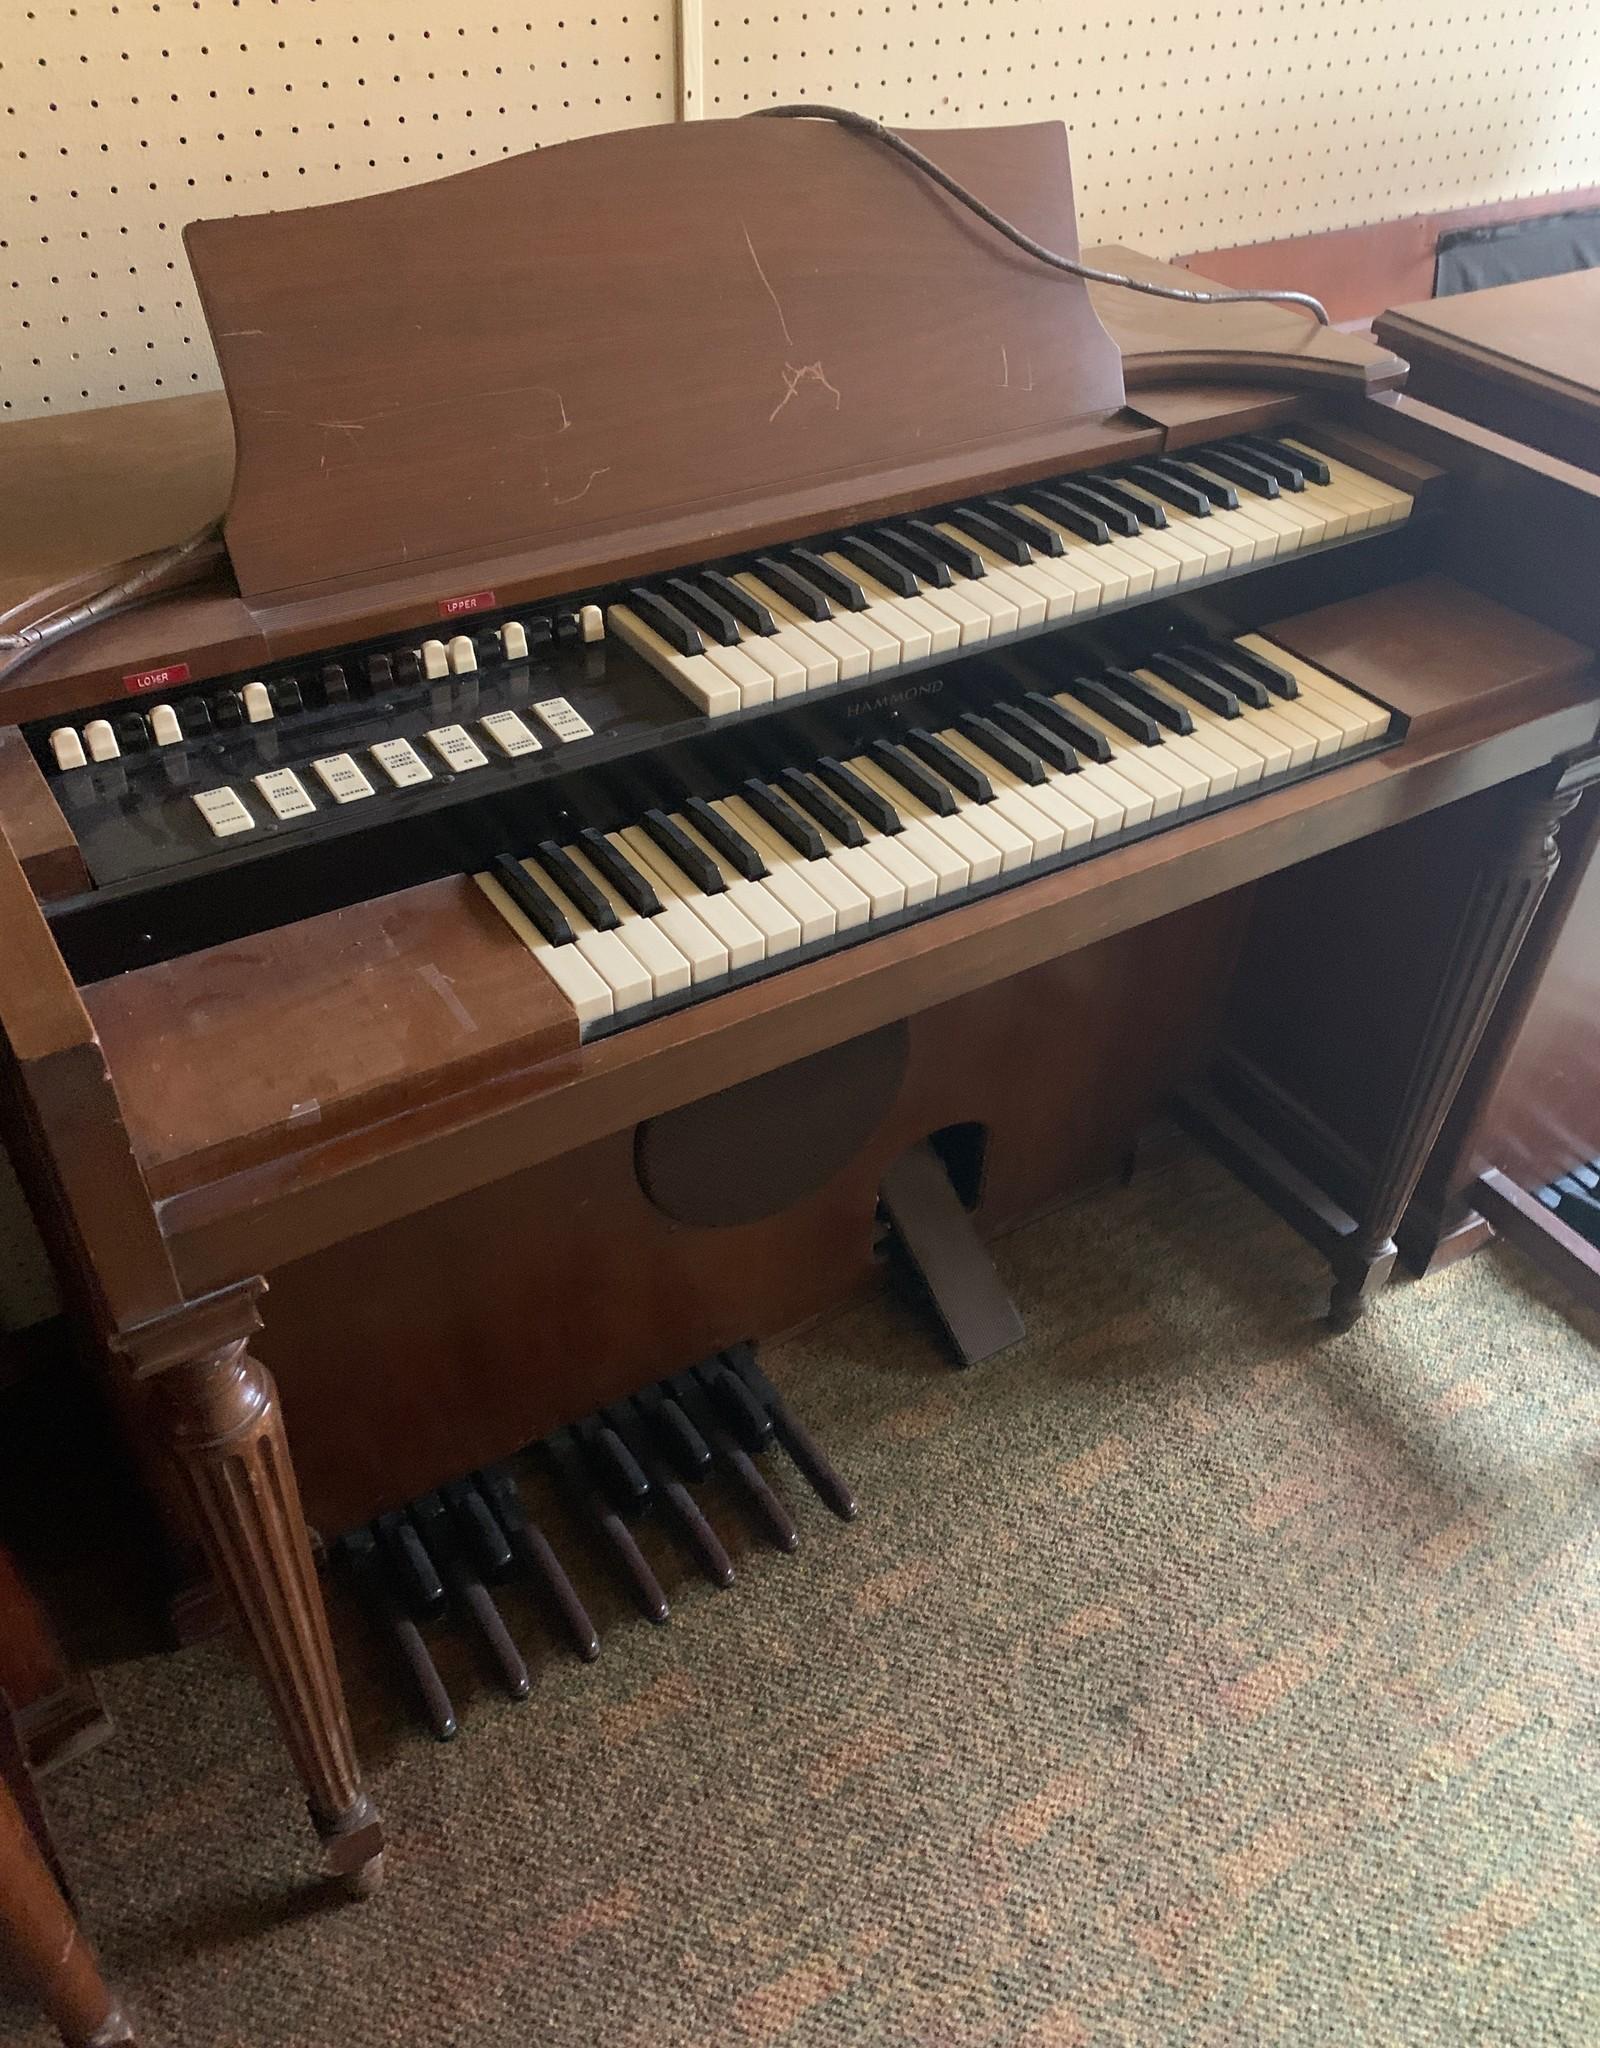 Hammond M2 Tone Generator Console Organ - c.1953